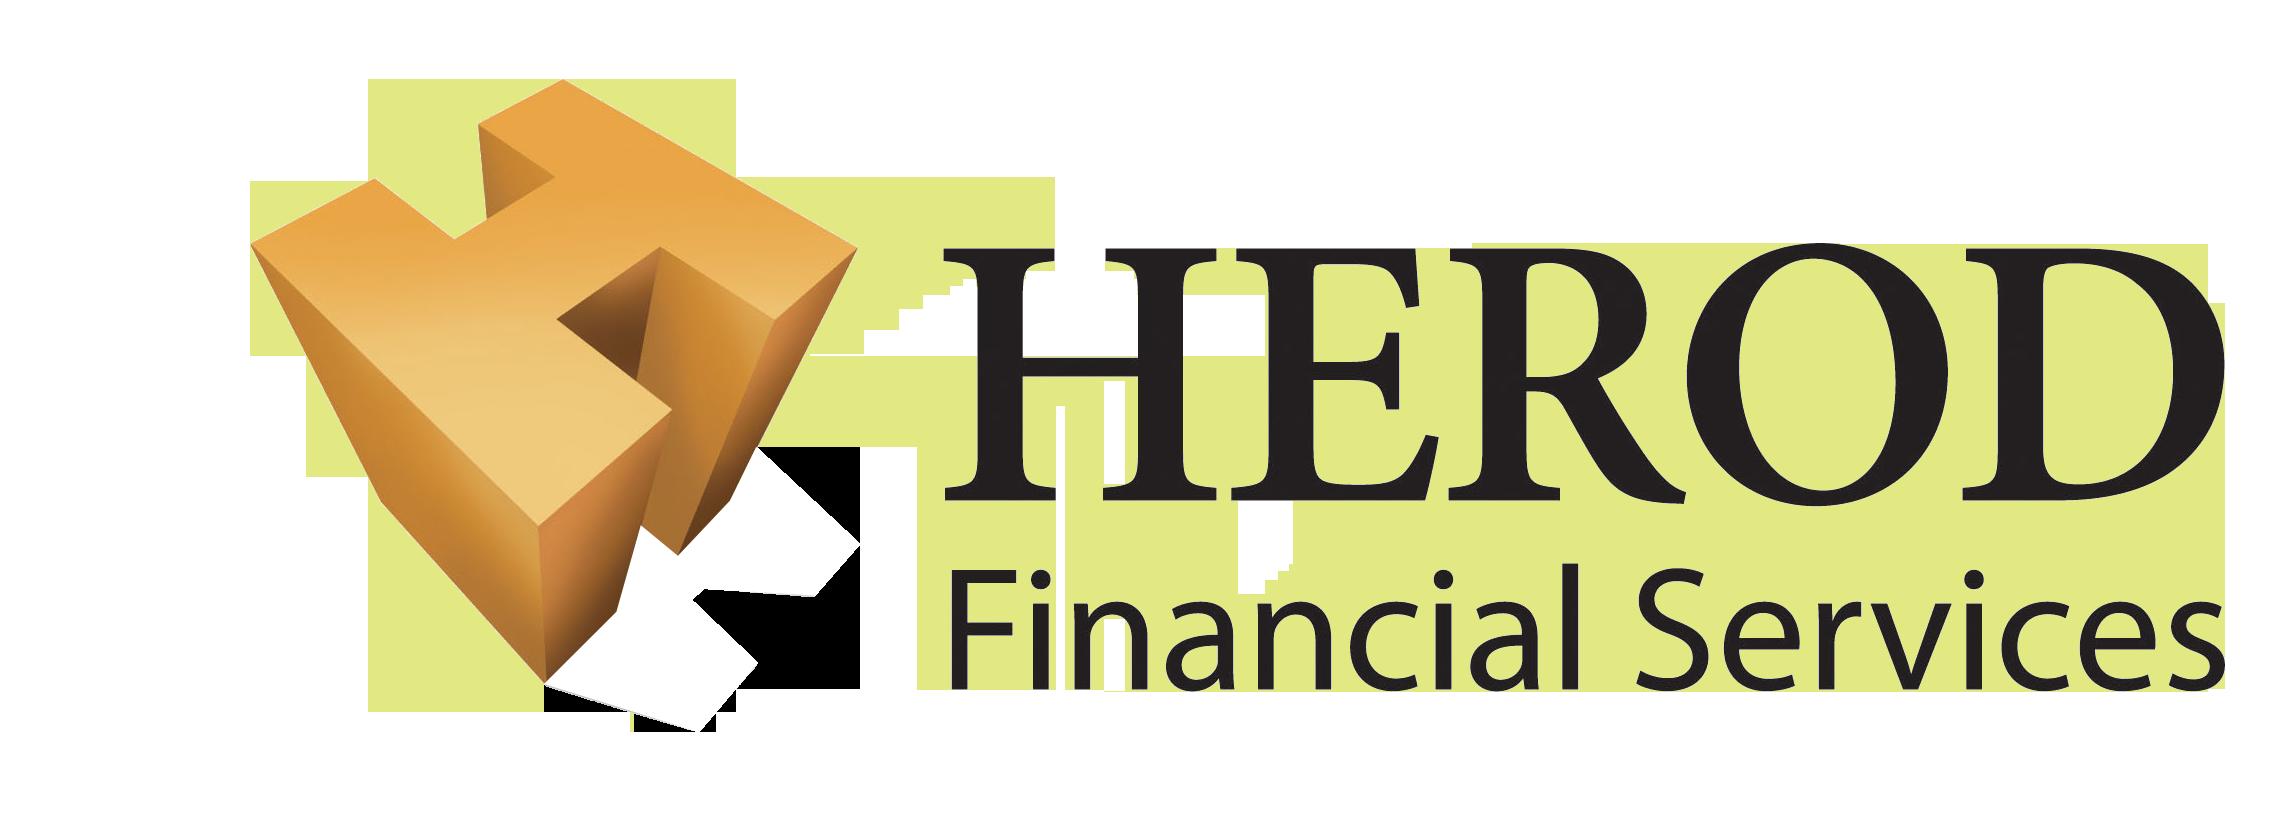 Herod Financial Services logo